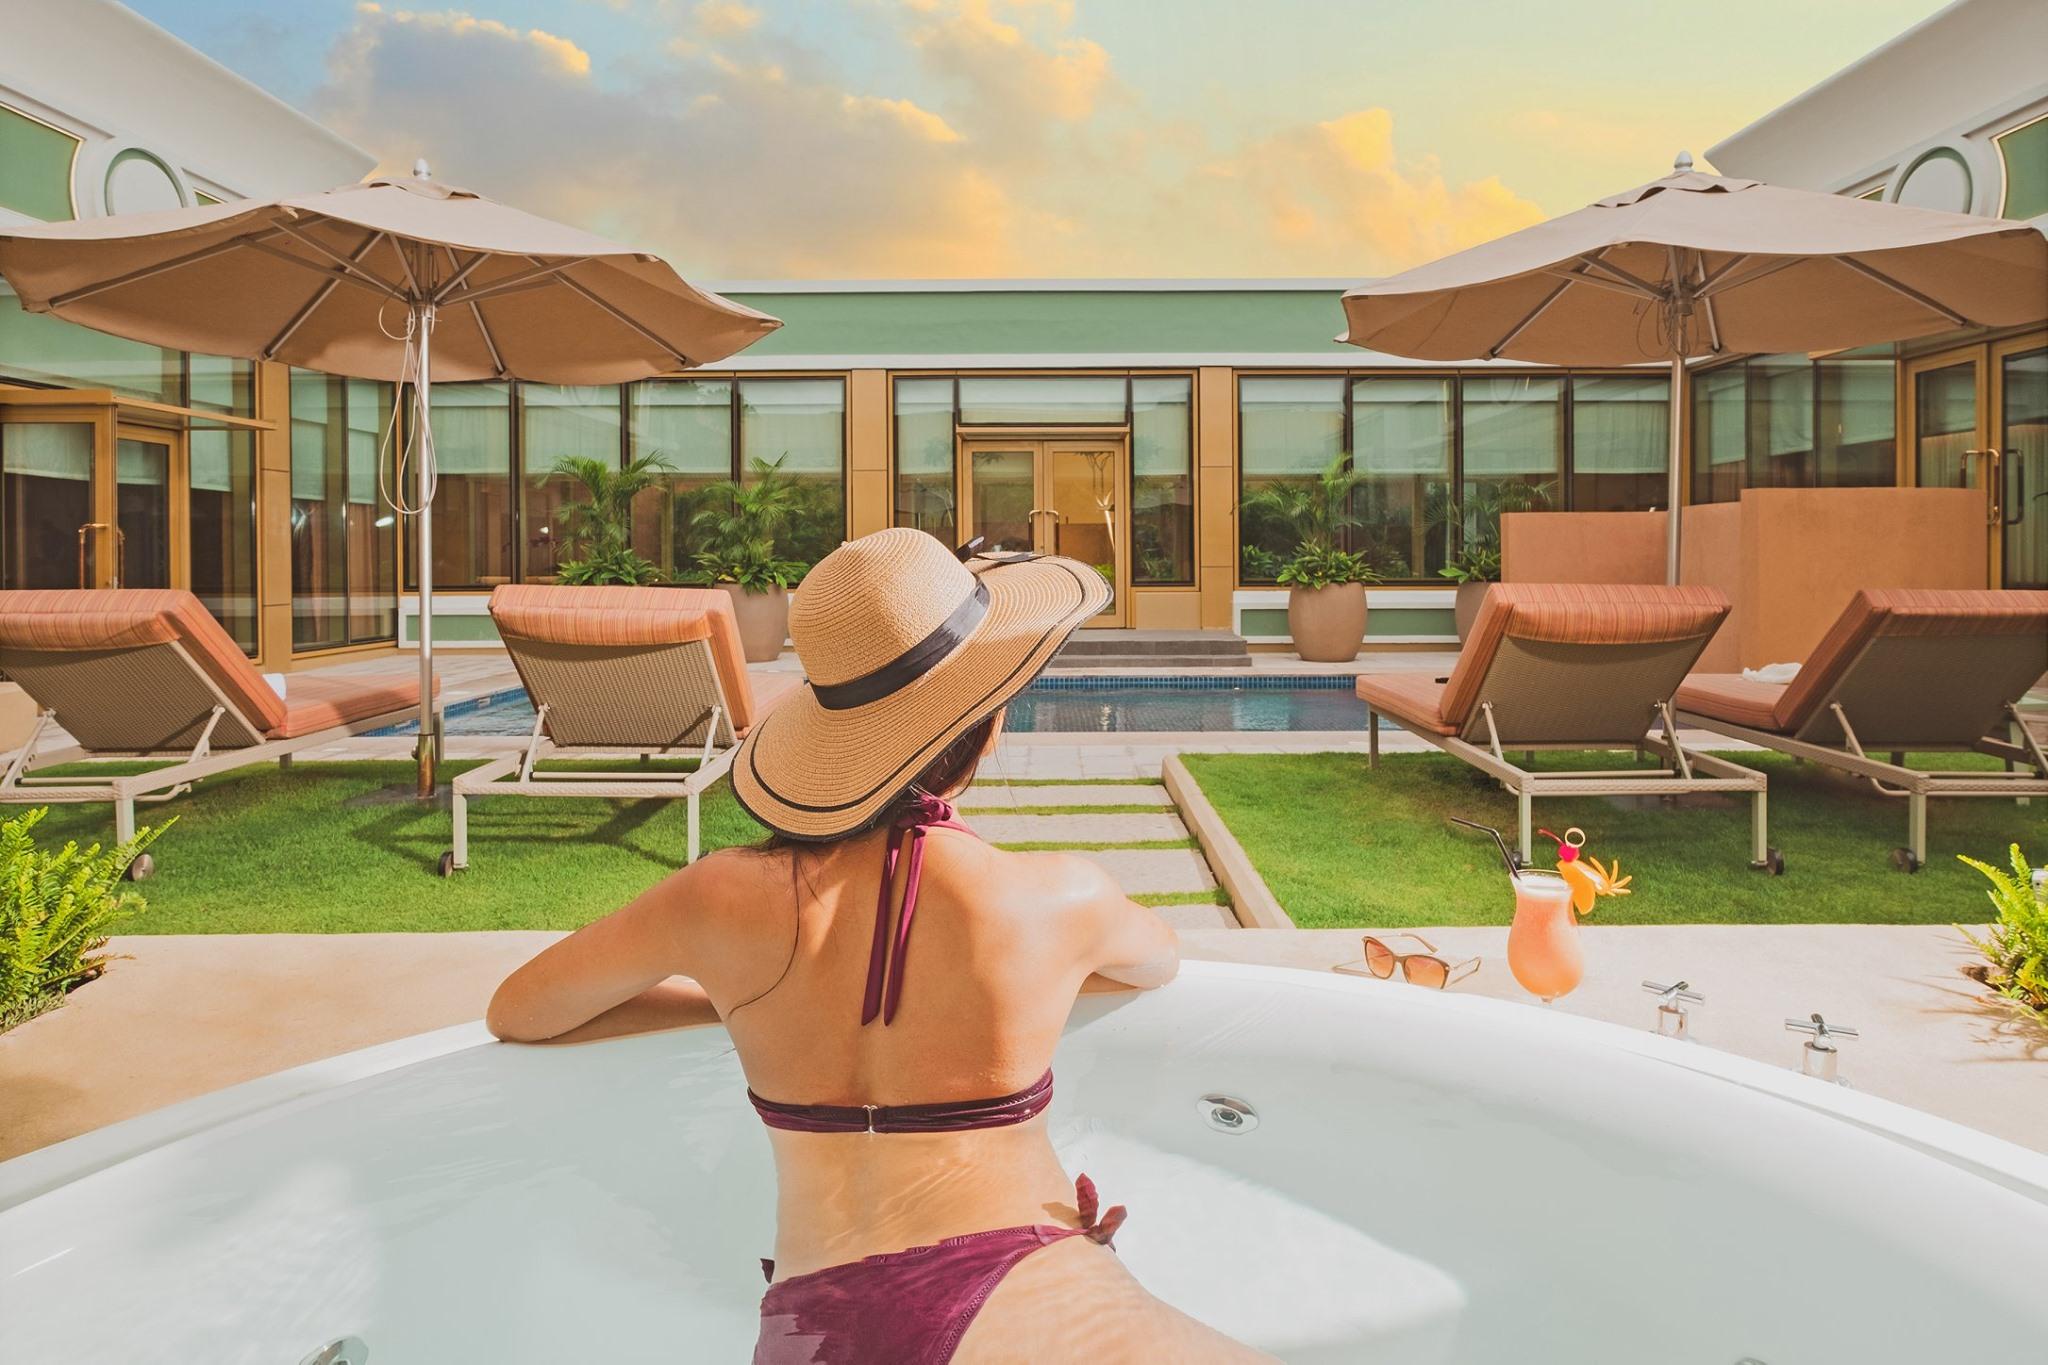 10 Best Hotels in Manila Philippines